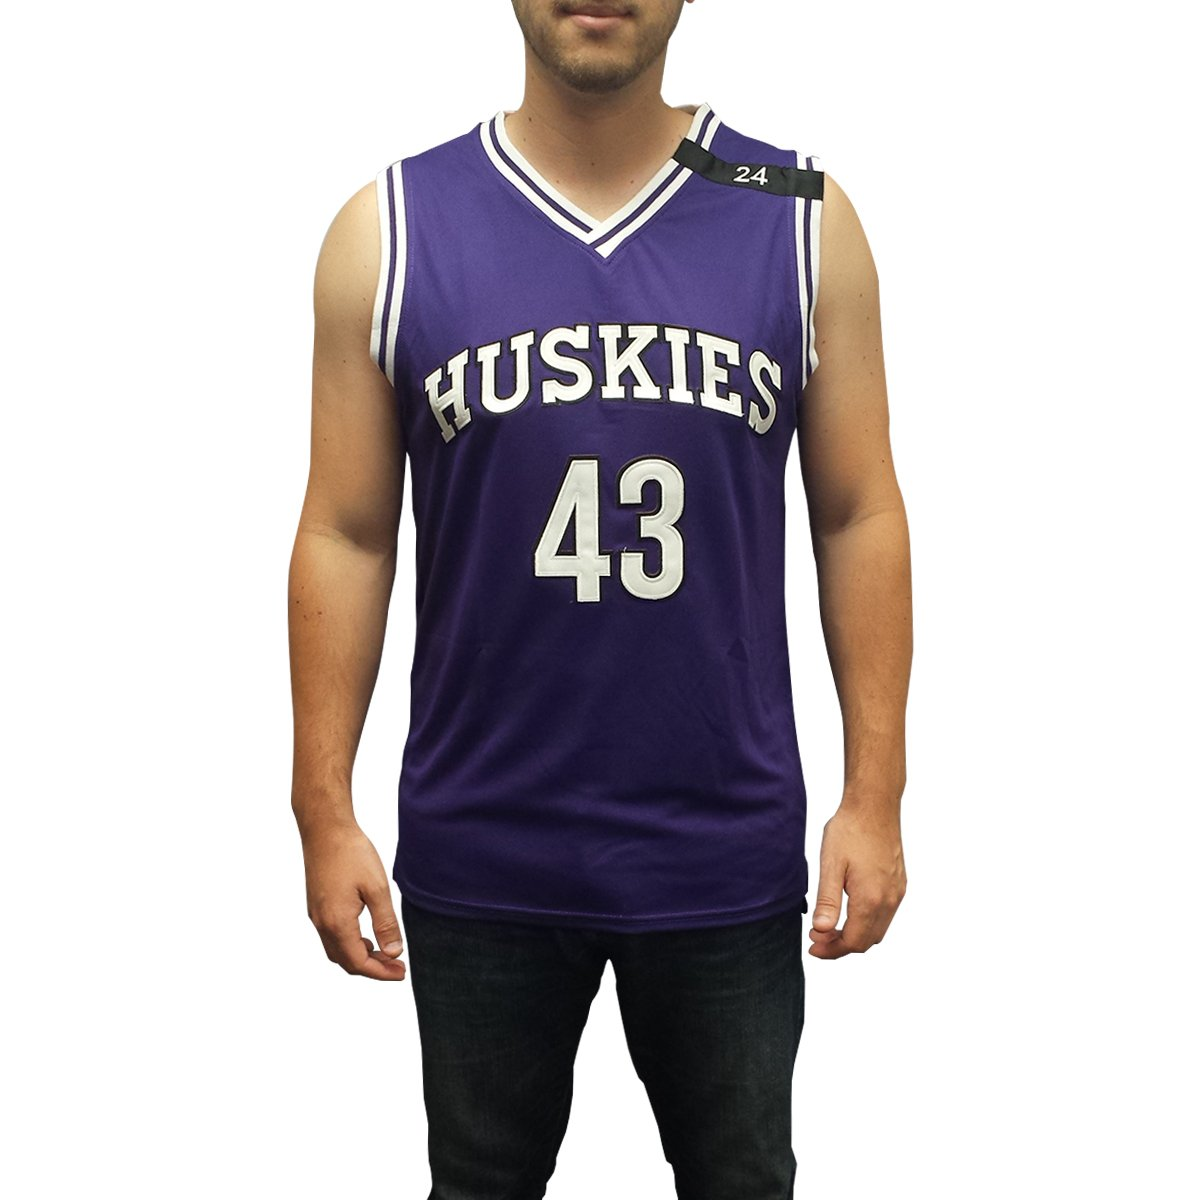 39aad05cd79 Amazon.com  Kenny Tyler  43 Huskies Purple Basketball Jersey The 6th Man  Costume Movie K.  Clothing